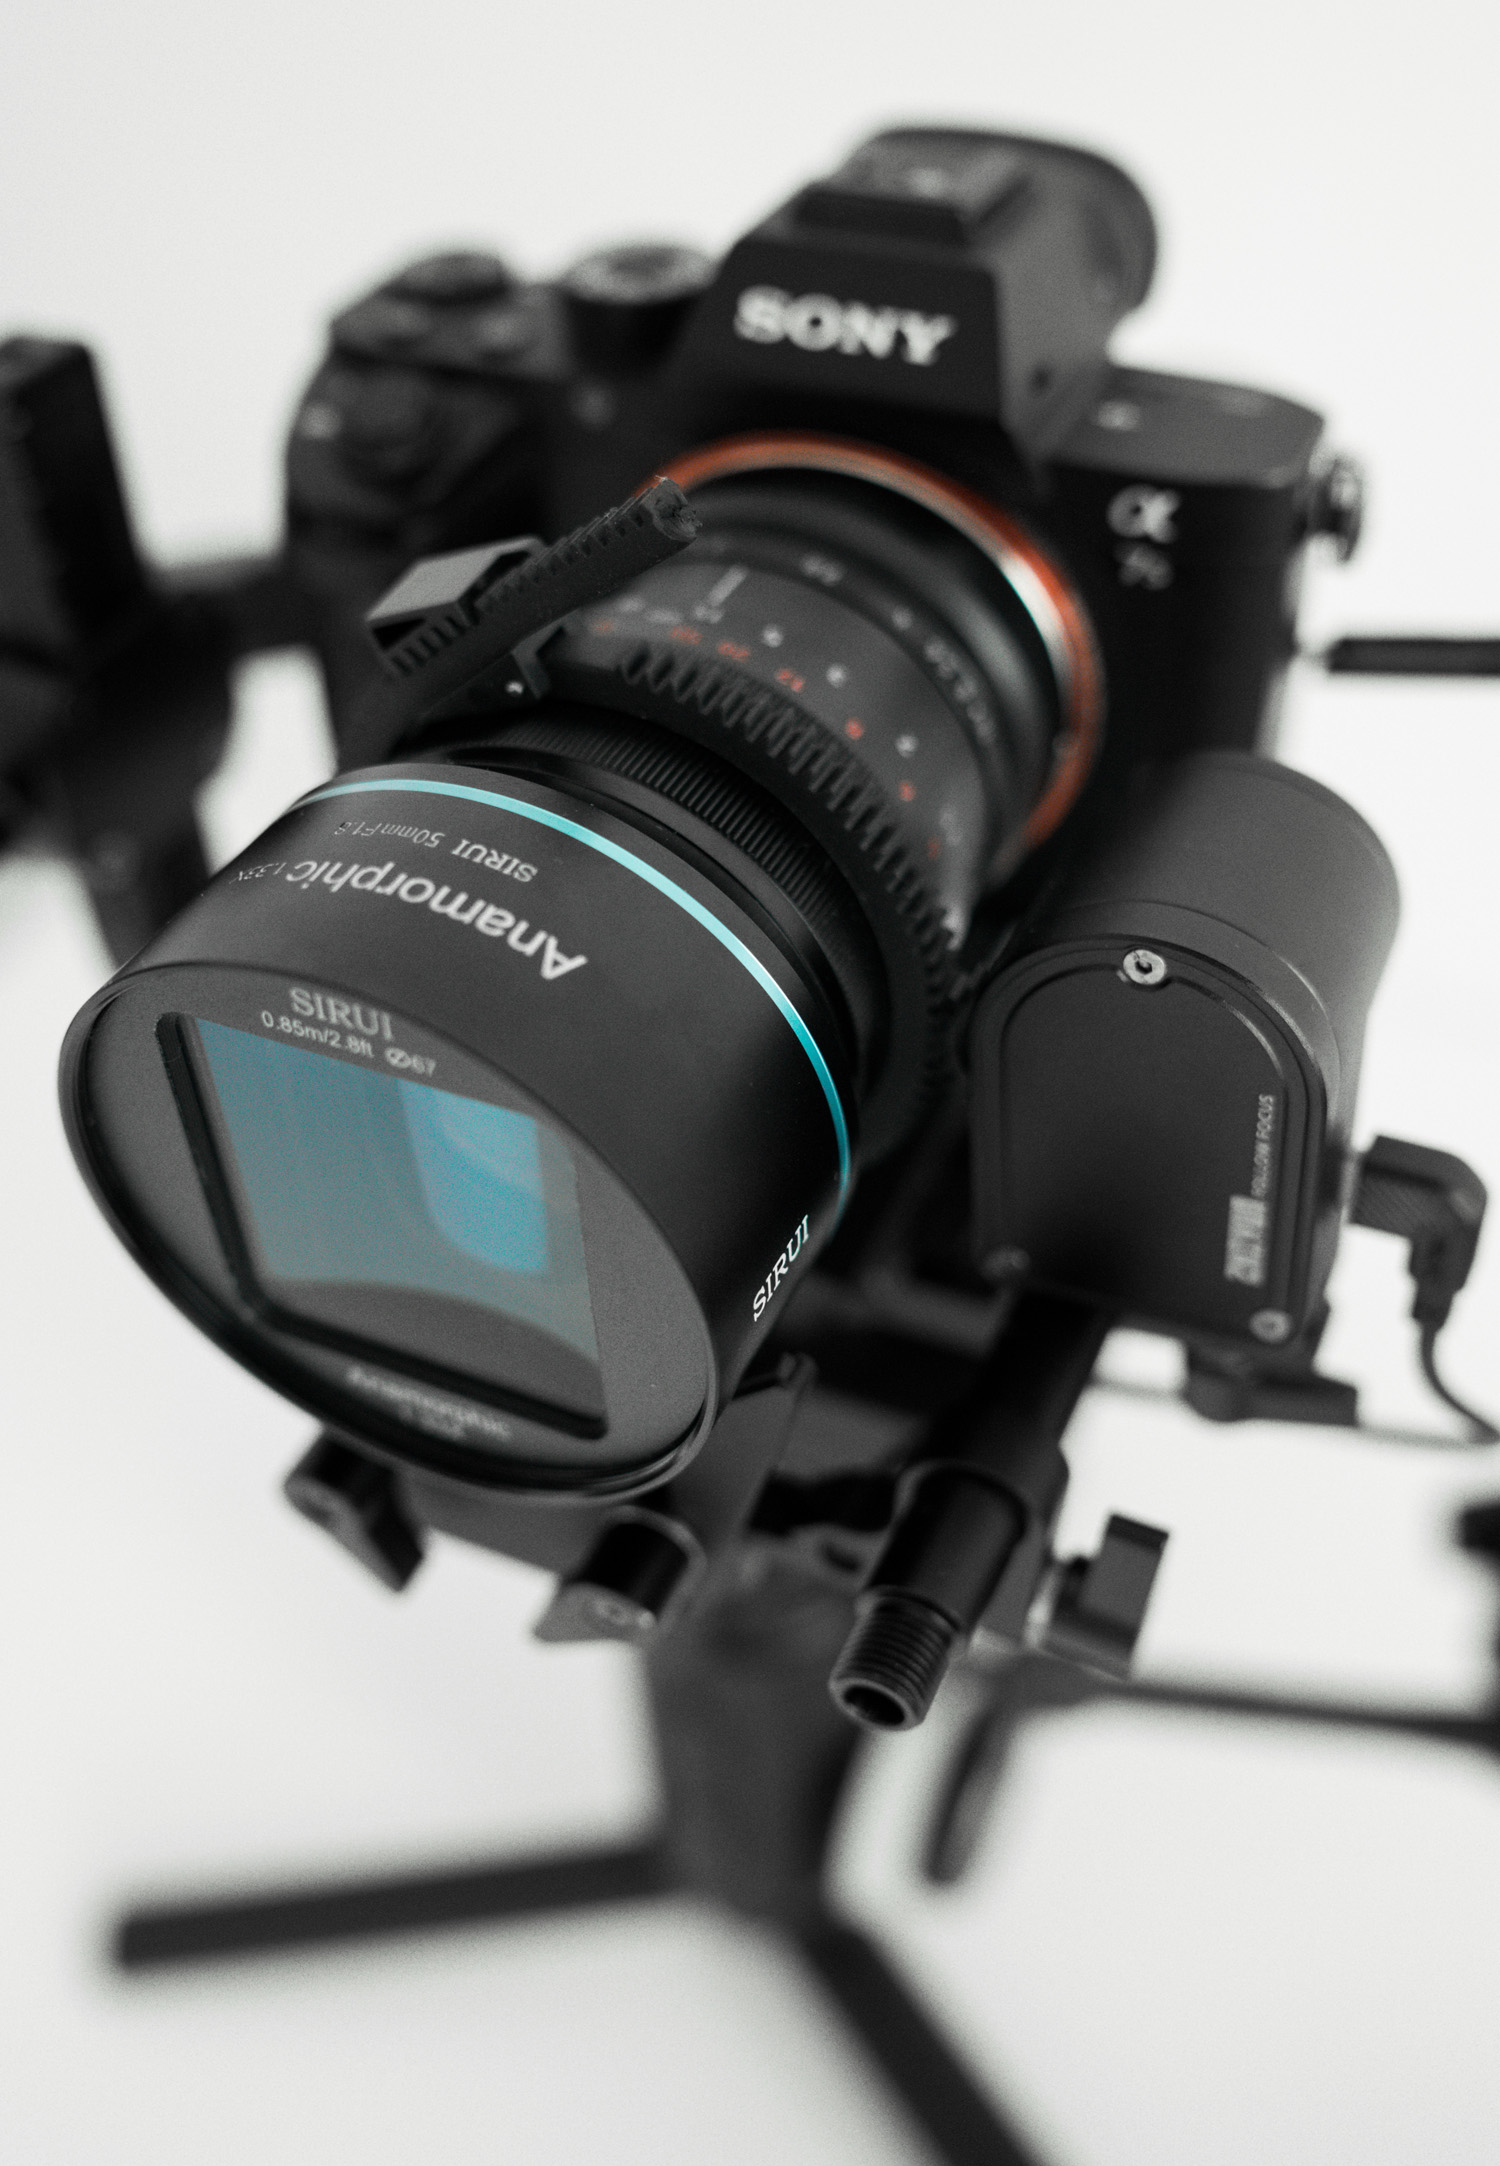 Sirui 50mm f/1.8 Anamorphic objektiiv